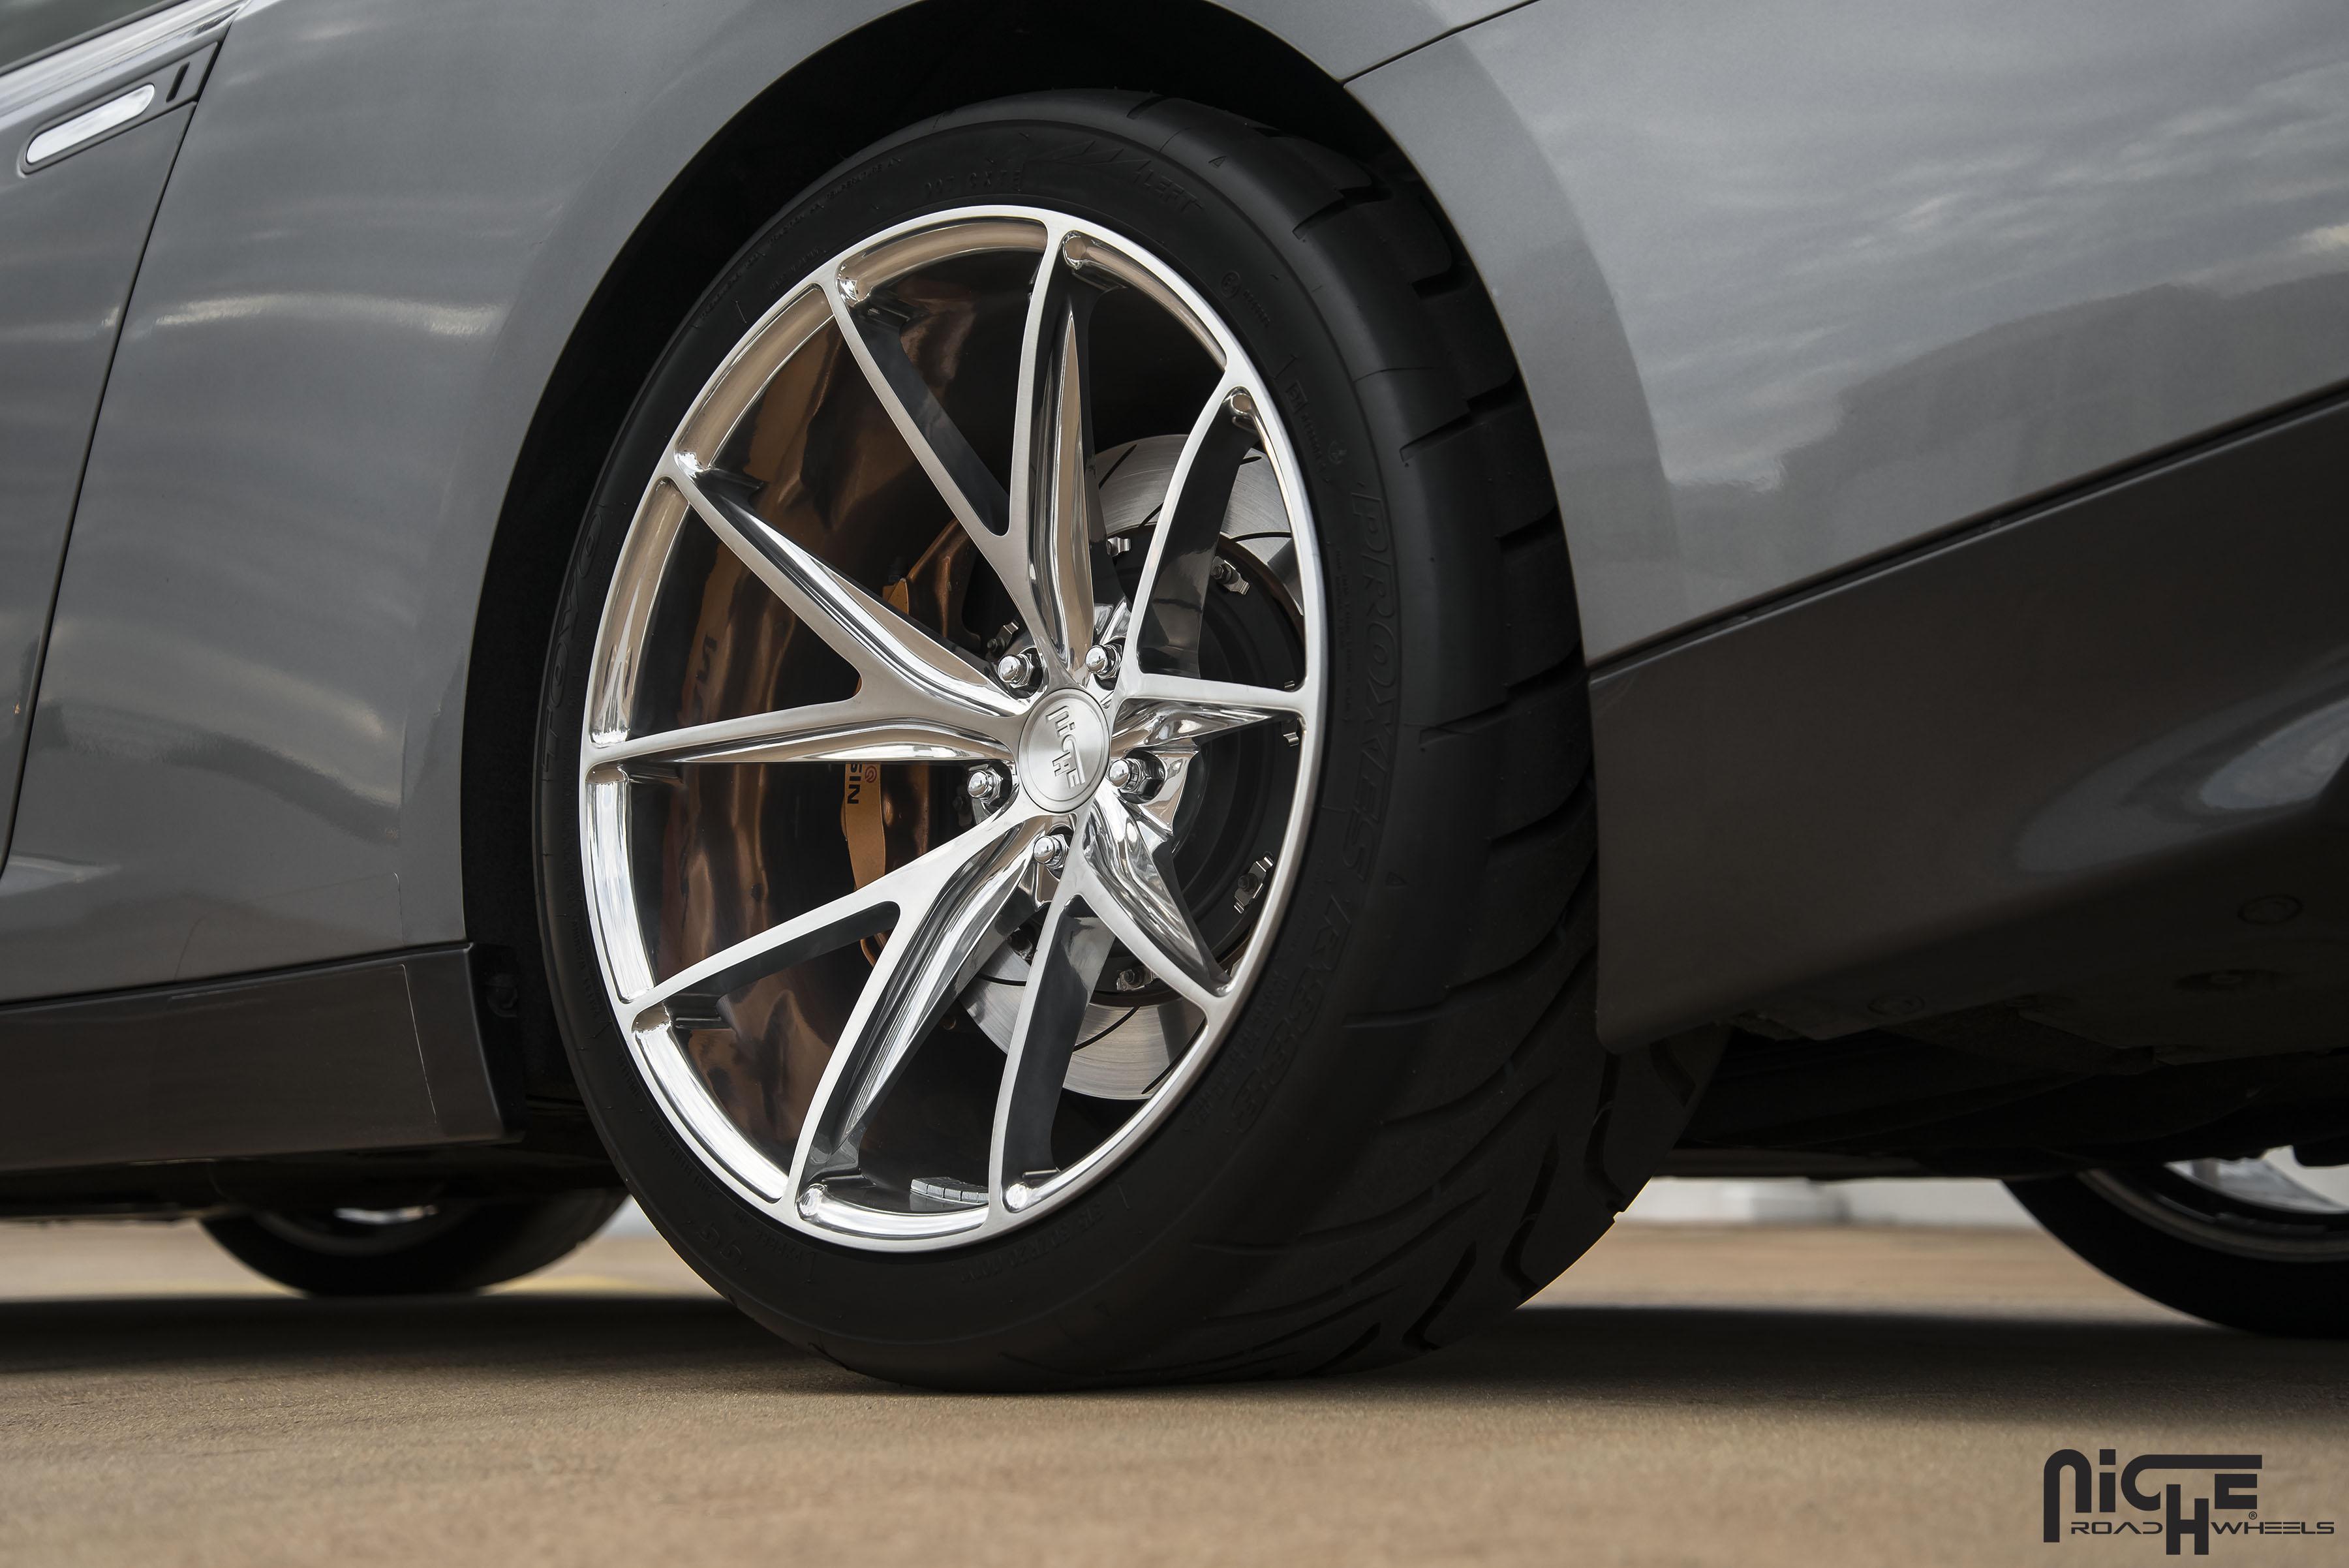 Nissan Gt R Misano Gallery Mht Wheels Inc Rims